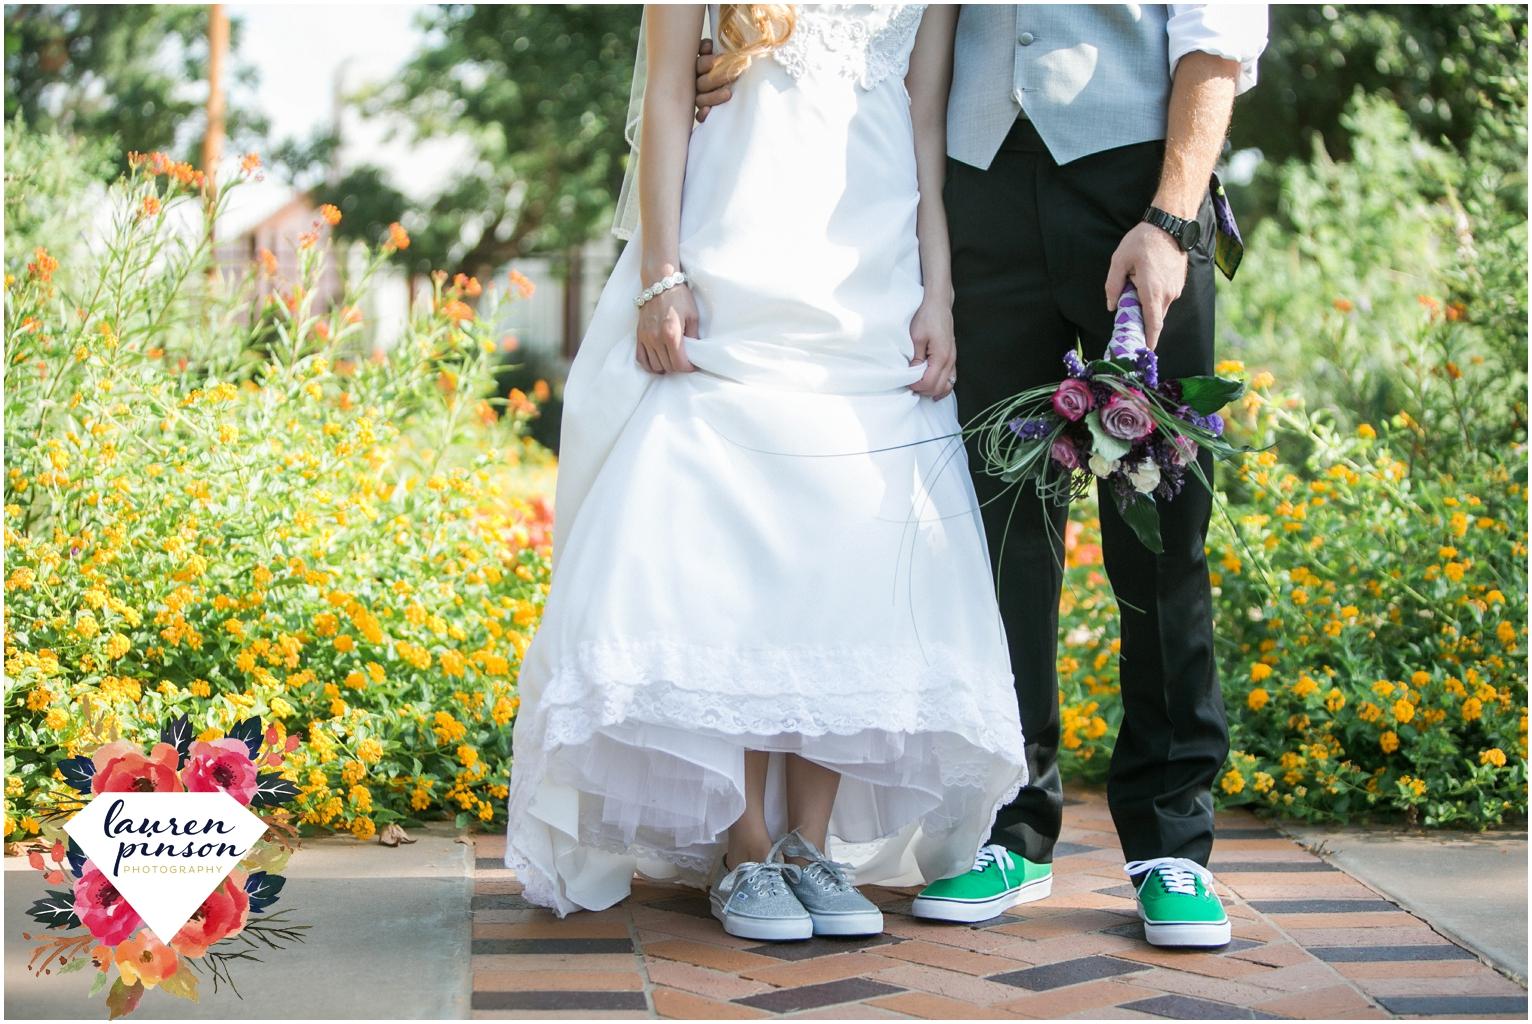 wichita-falls-wedding-photography-at-fain-presbyterian-church-and-the-wellington-timeless-classic-modern-photographer_1229.jpg